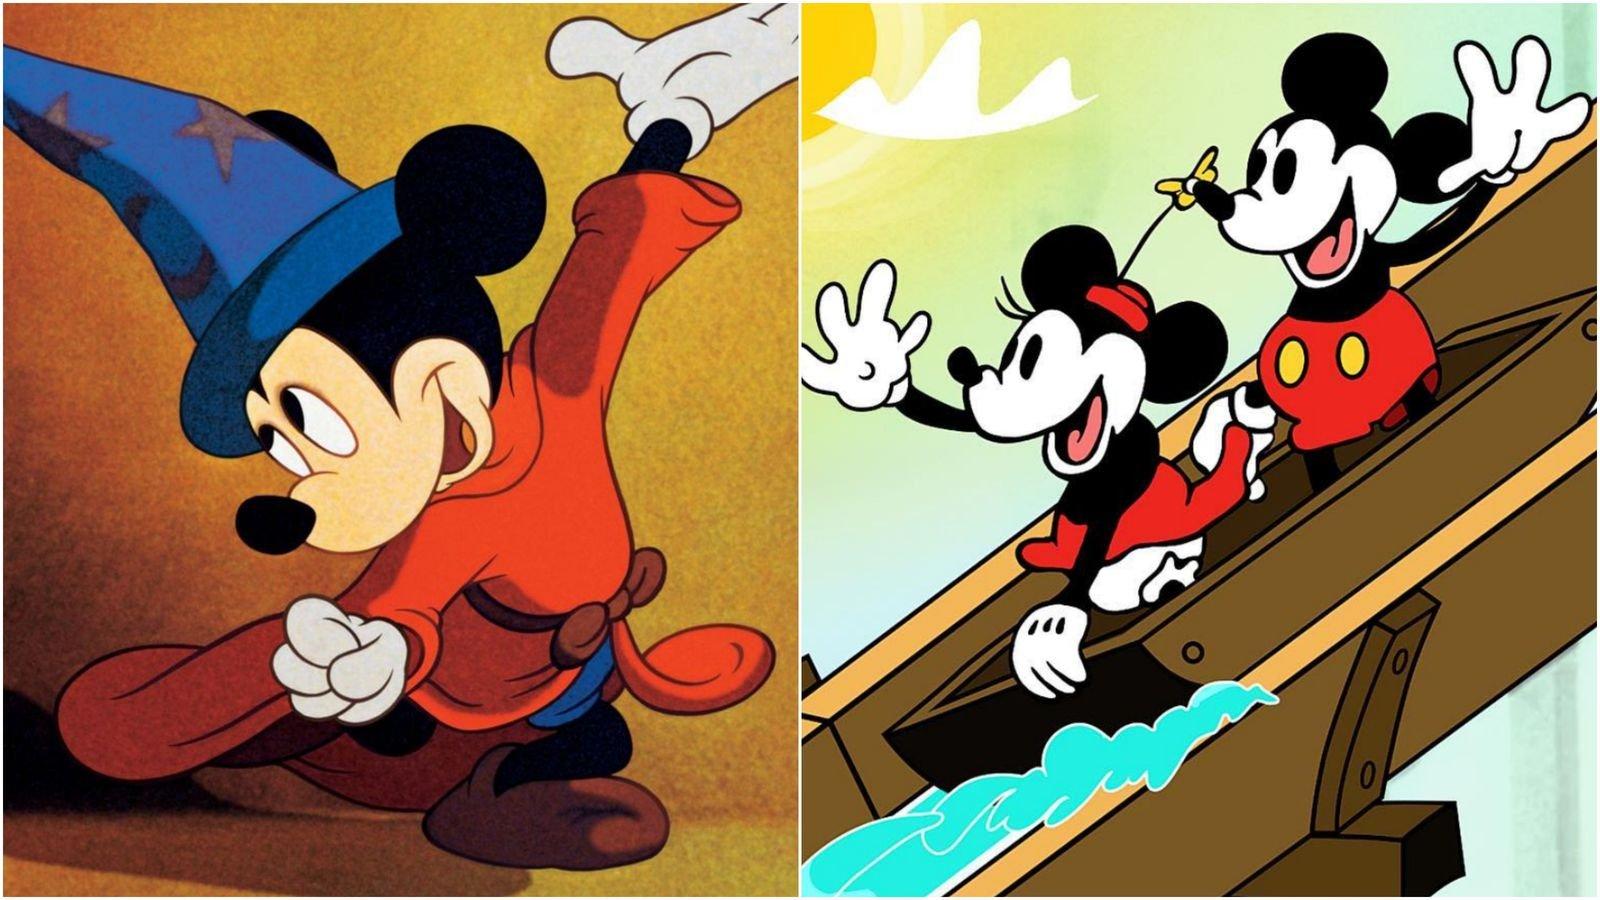 img 5bd8e2255a26c.png?resize=300,169 - 【米奇90週年】關於迪士尼米老鼠的10個秘密:他原本是隻兔子,跟米妮竟然是「這個」關係!